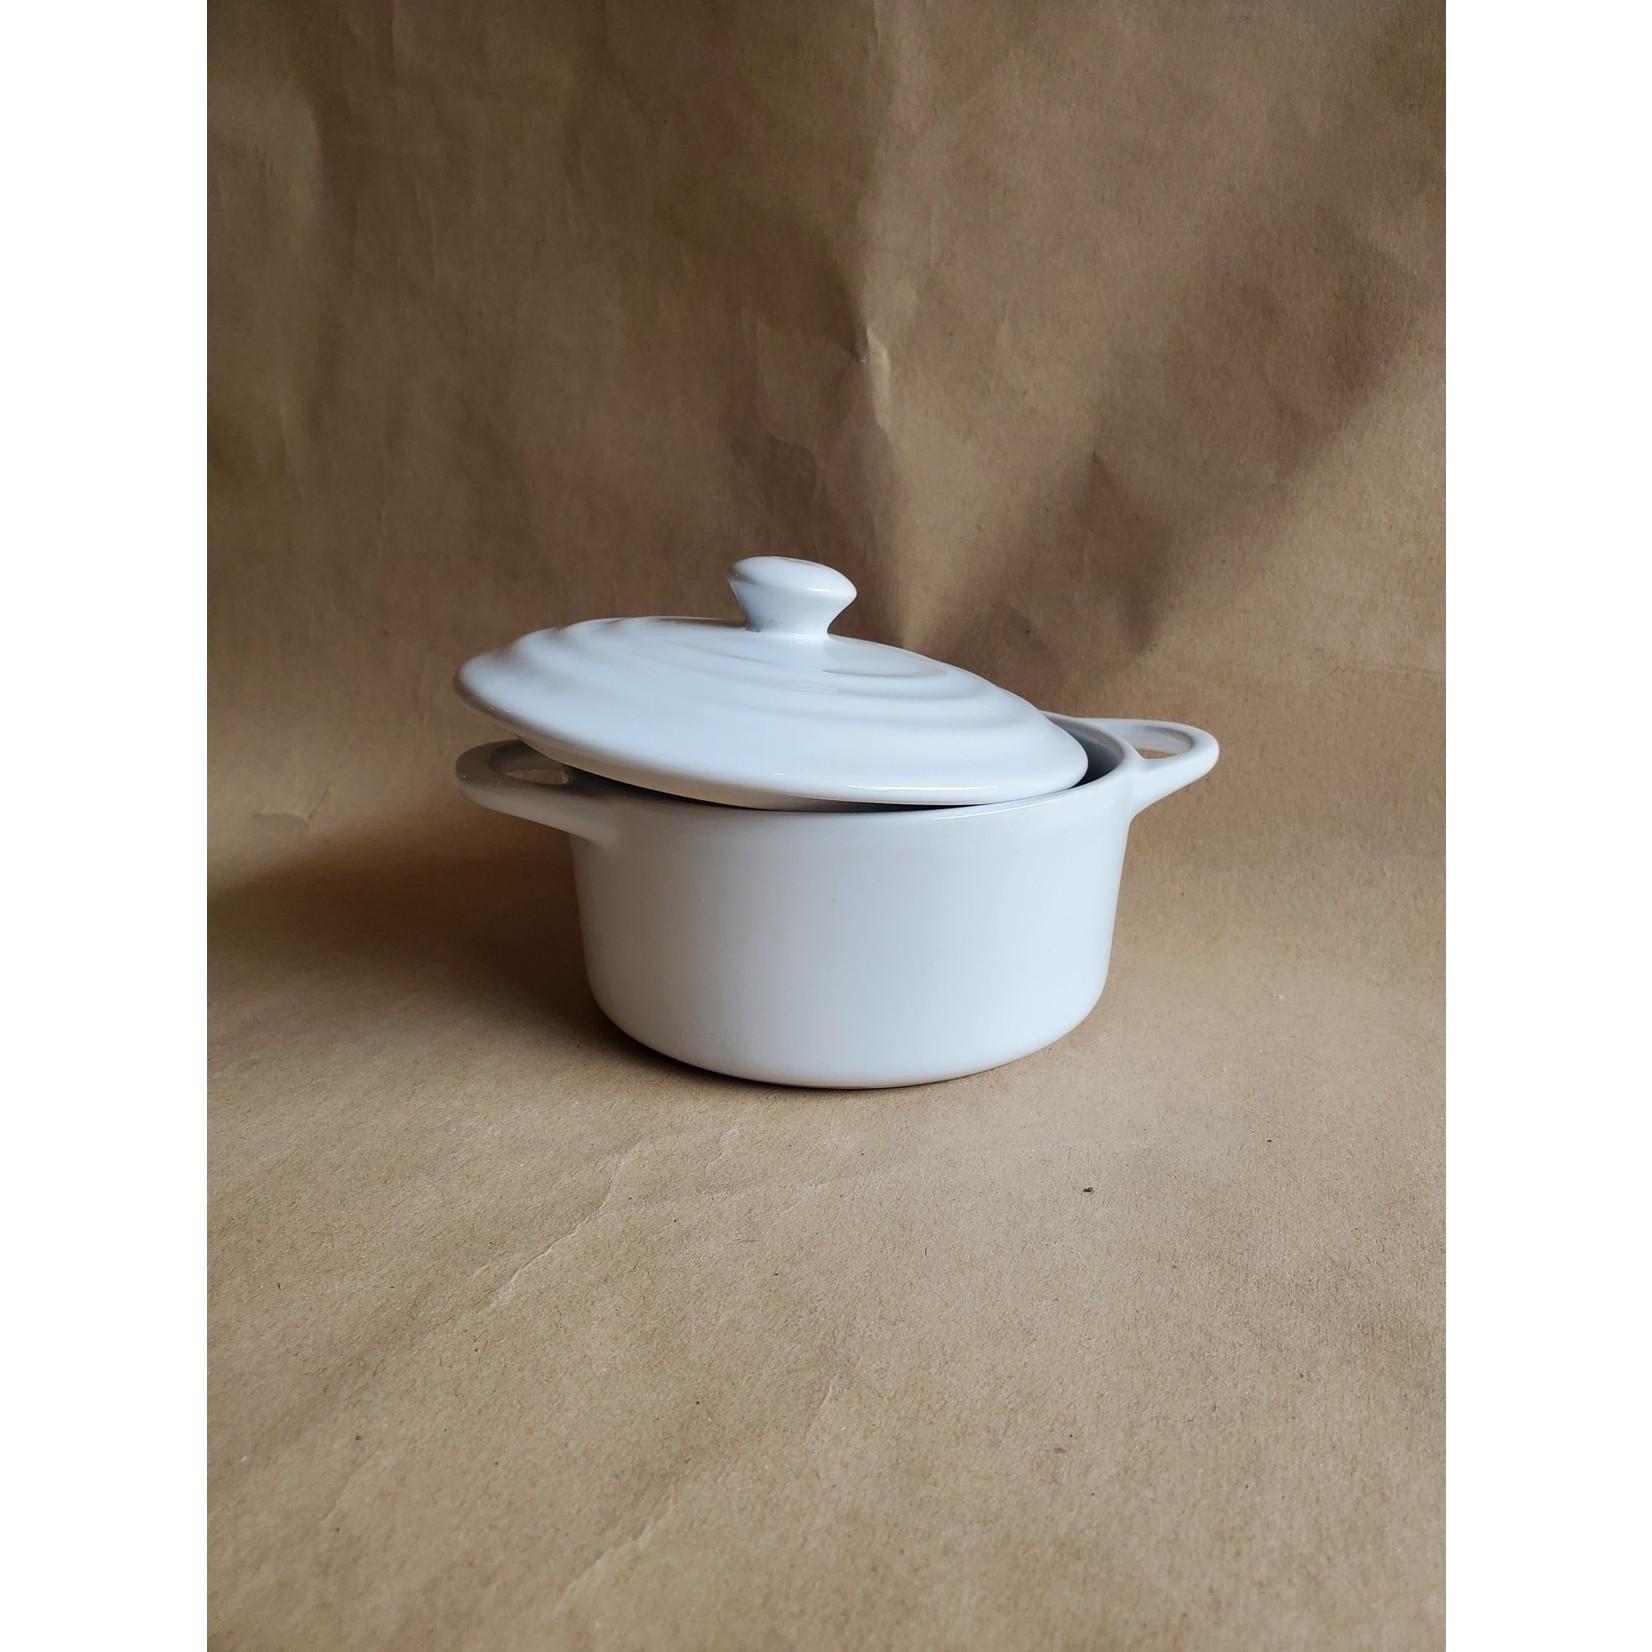 Small White ceramic pot